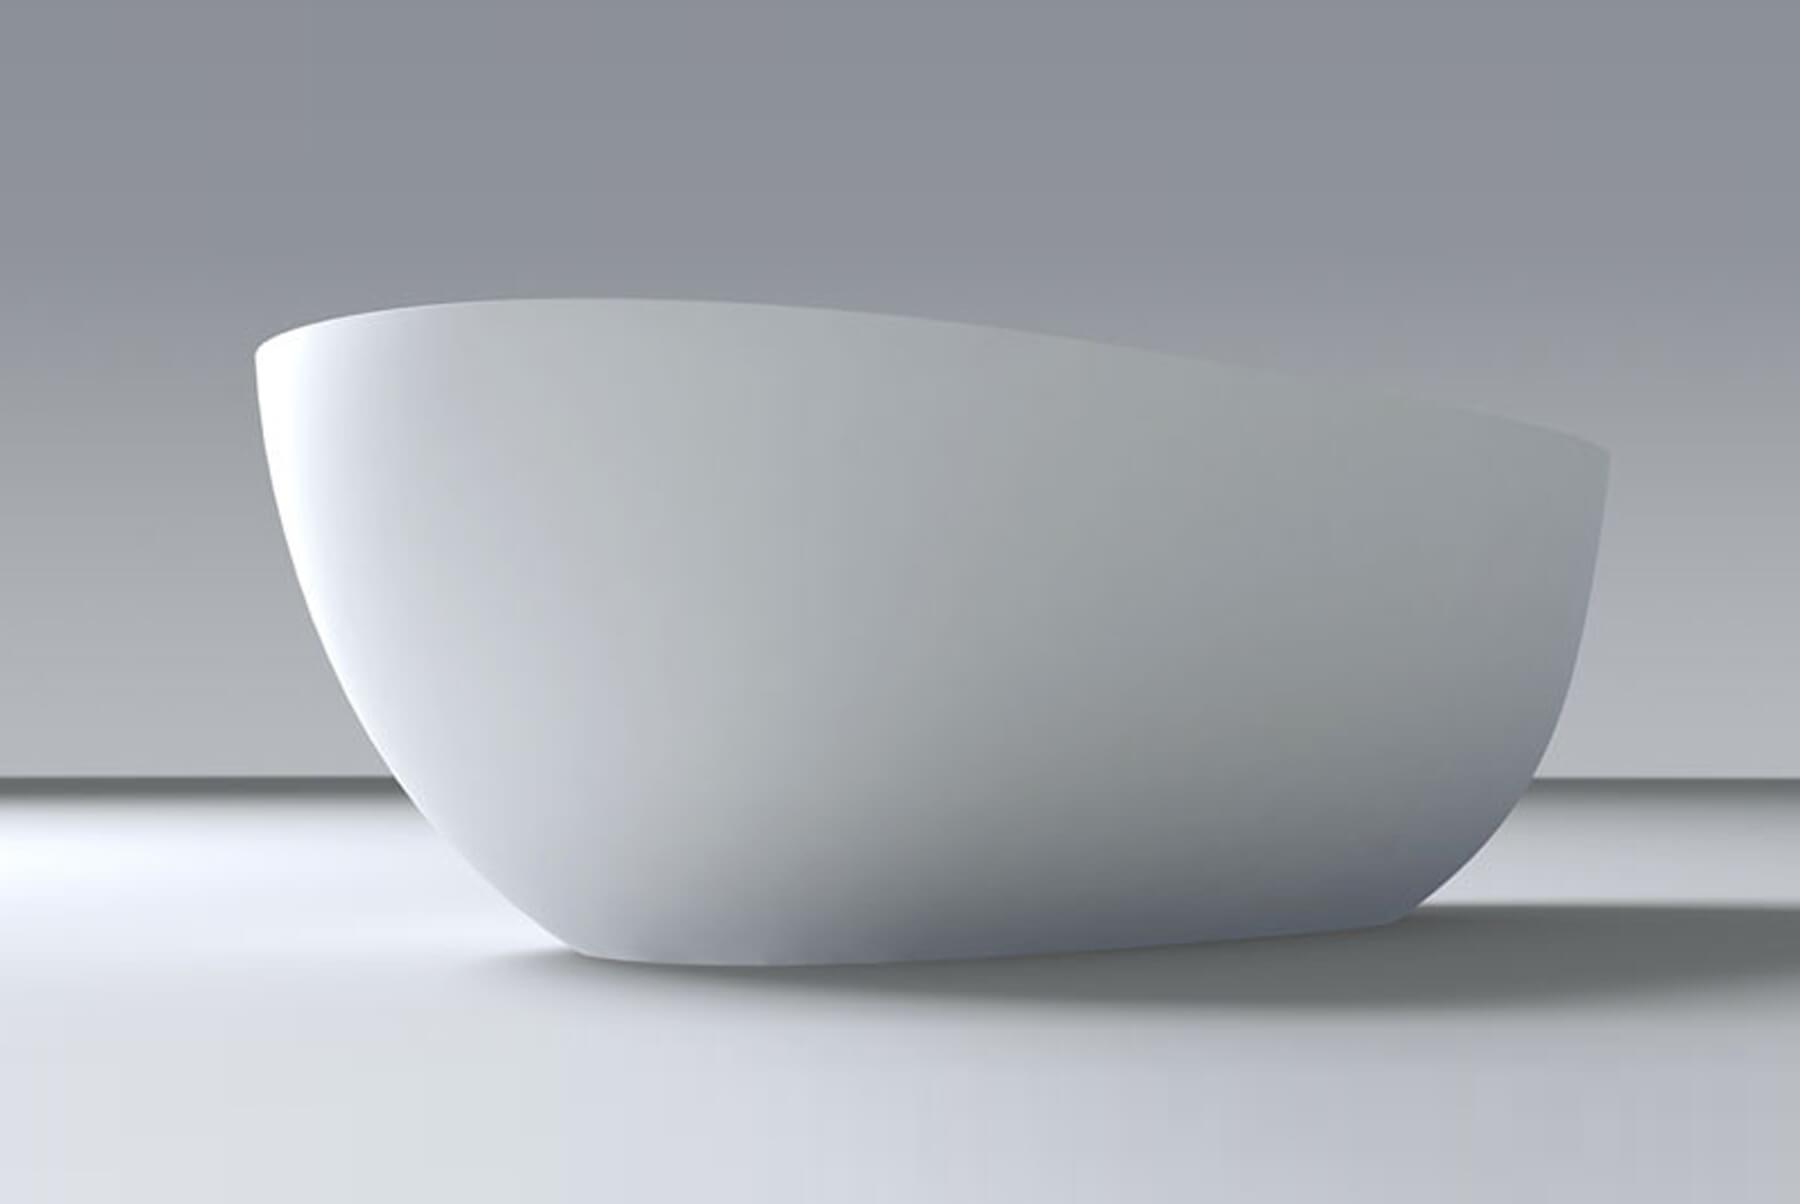 Bath-Tubs-WATERS-CLOUD-BATH-TUB-BELOW-1800x1204